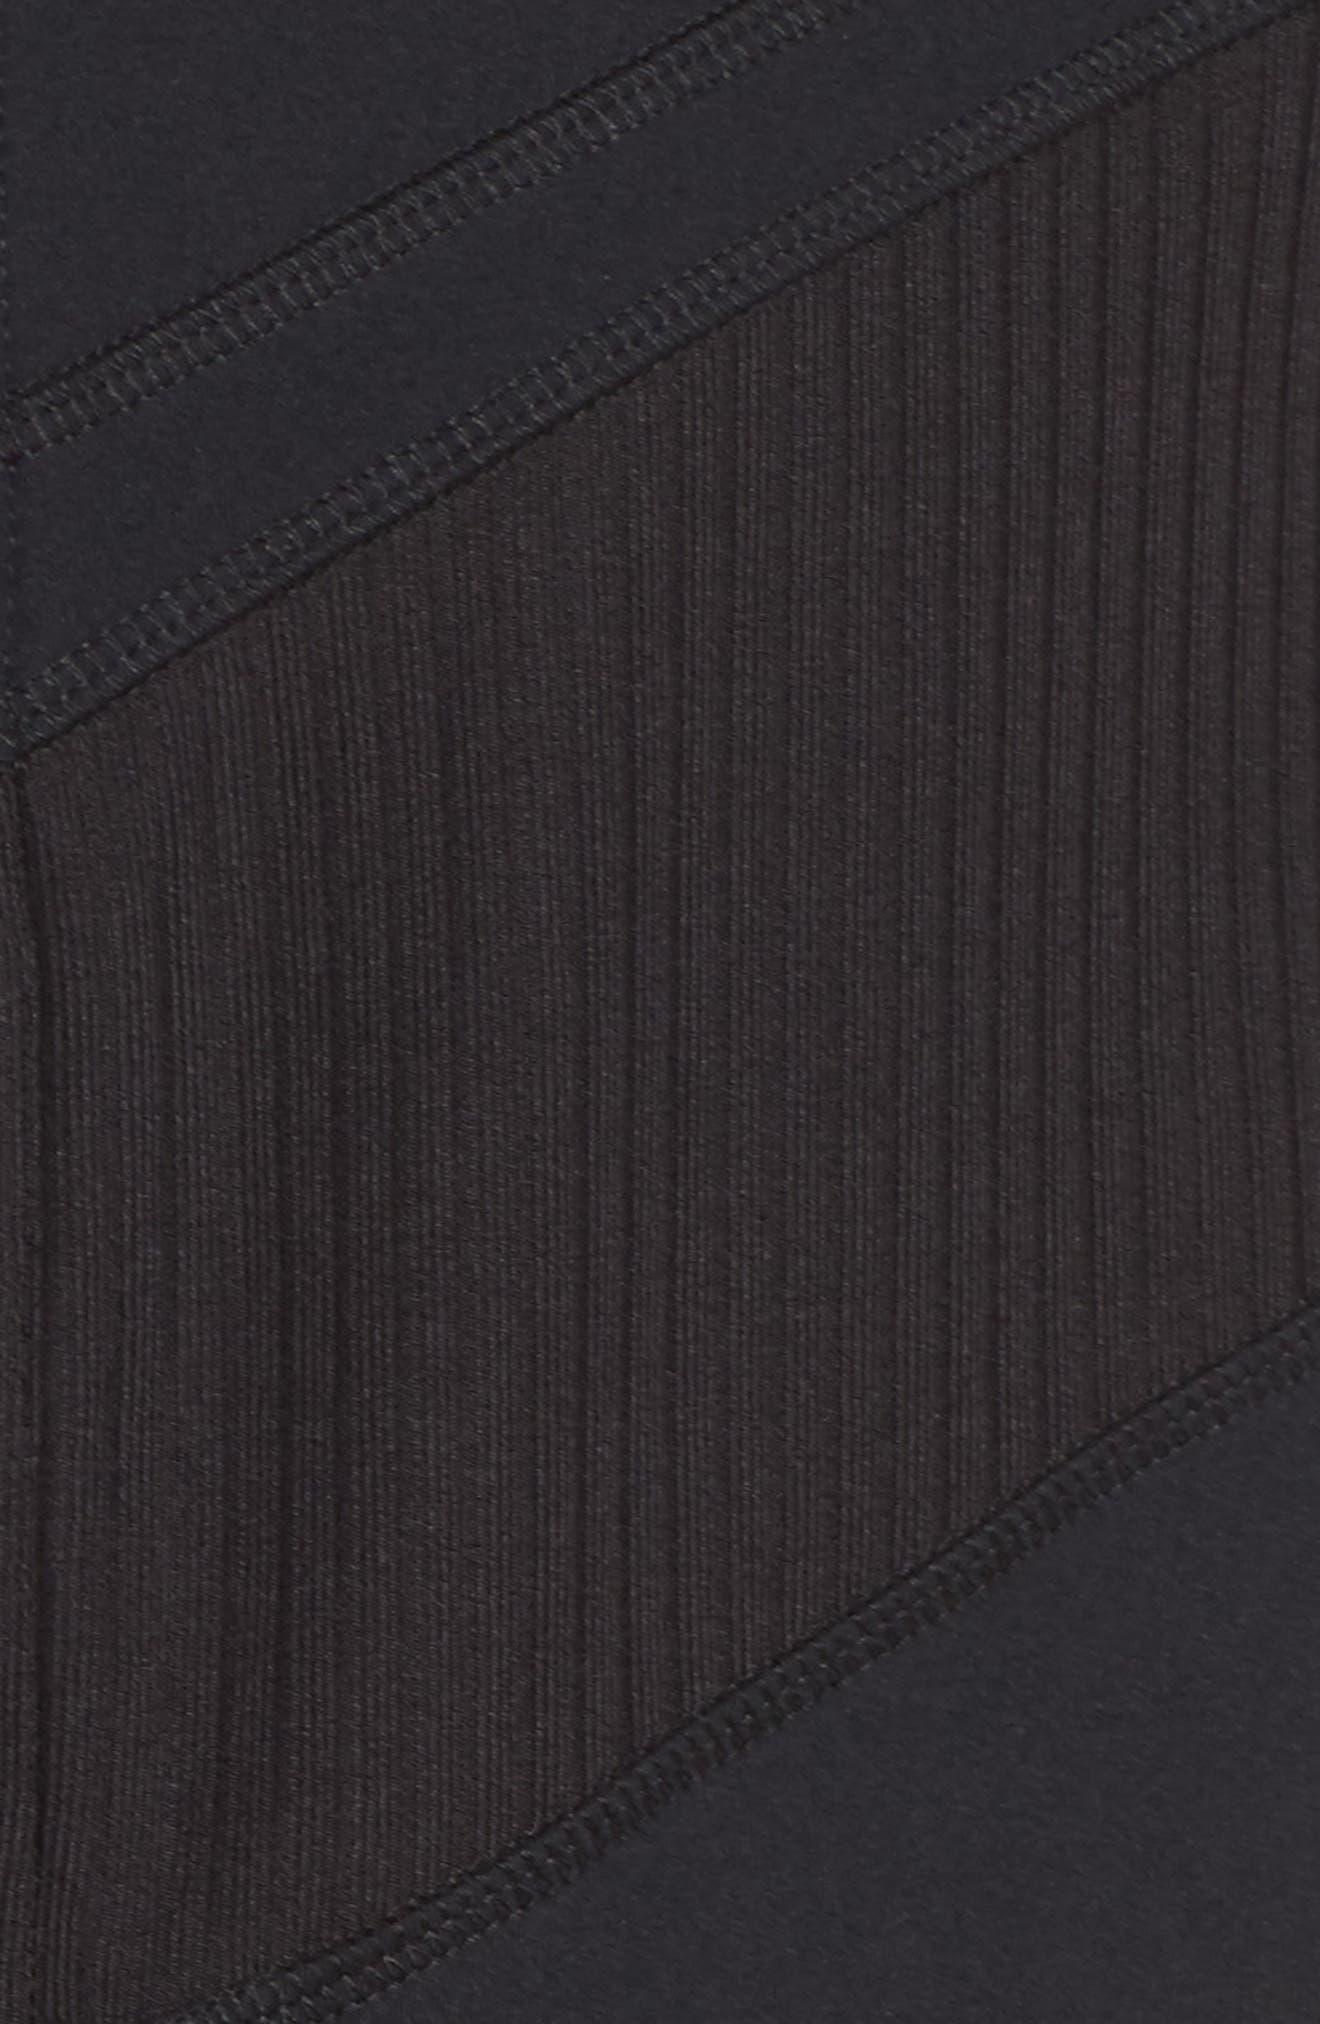 Cato Quarter Zip Pullover,                             Alternate thumbnail 6, color,                             Black